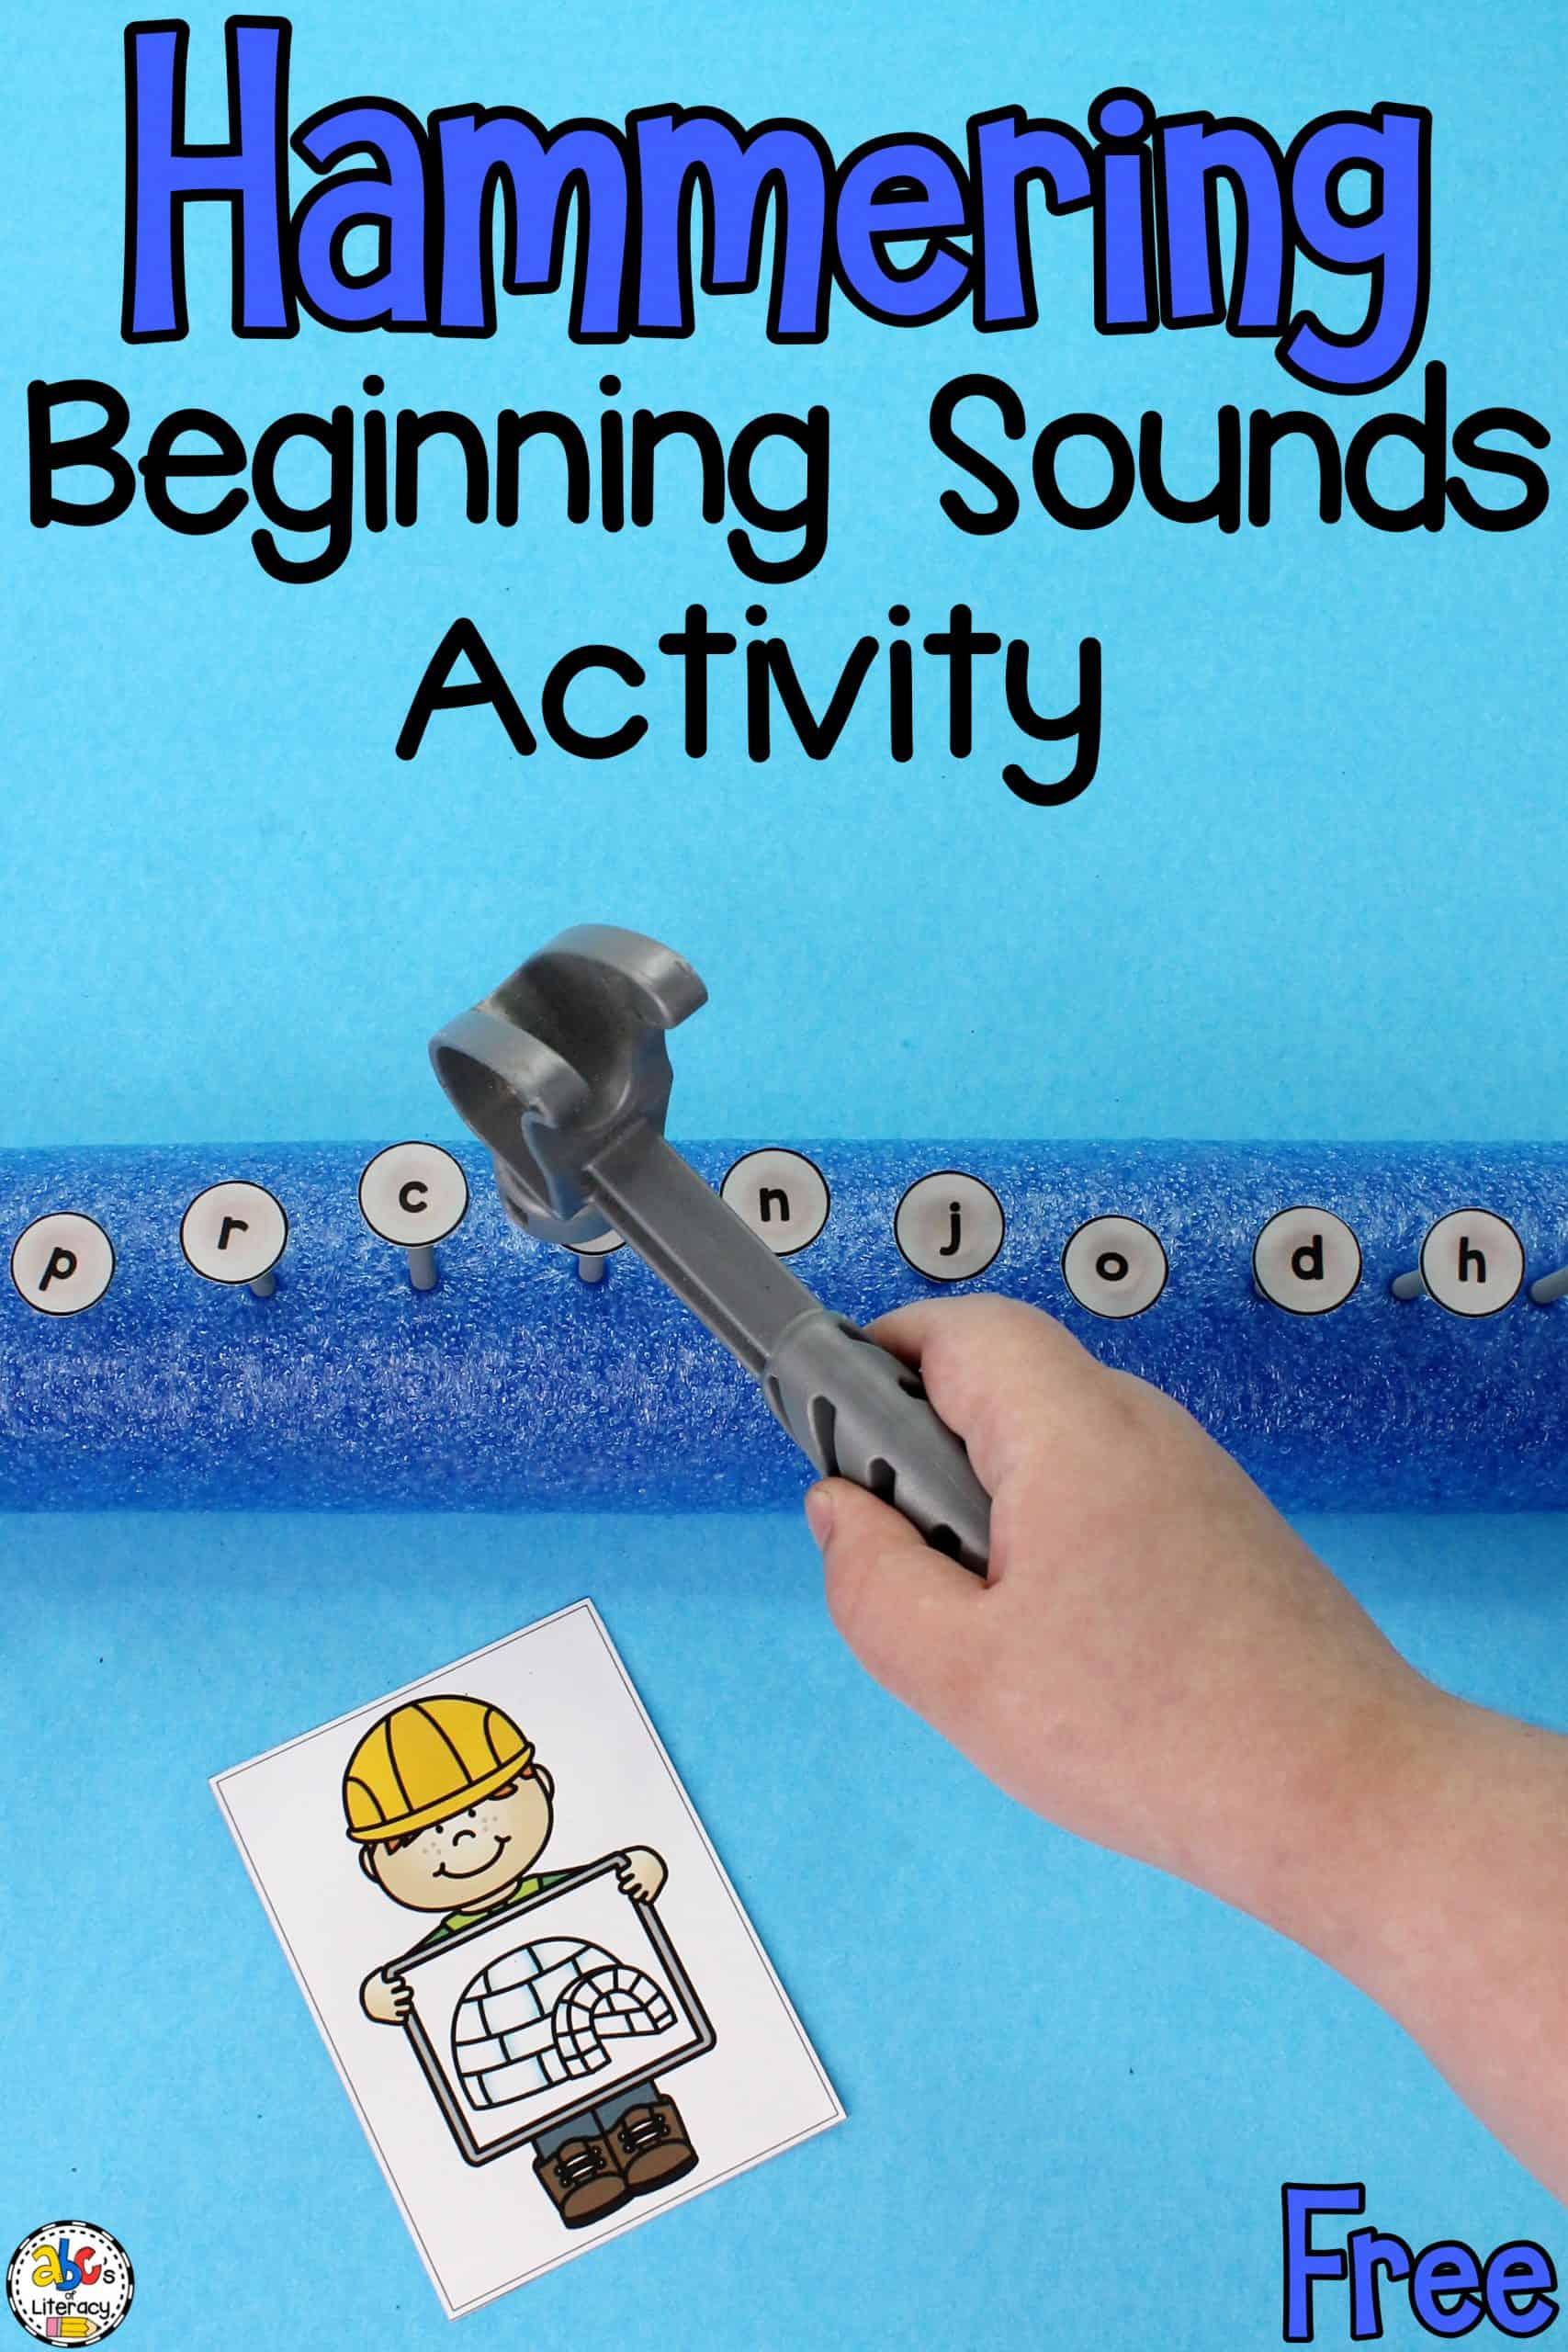 Hammering Beginning Sounds Activity